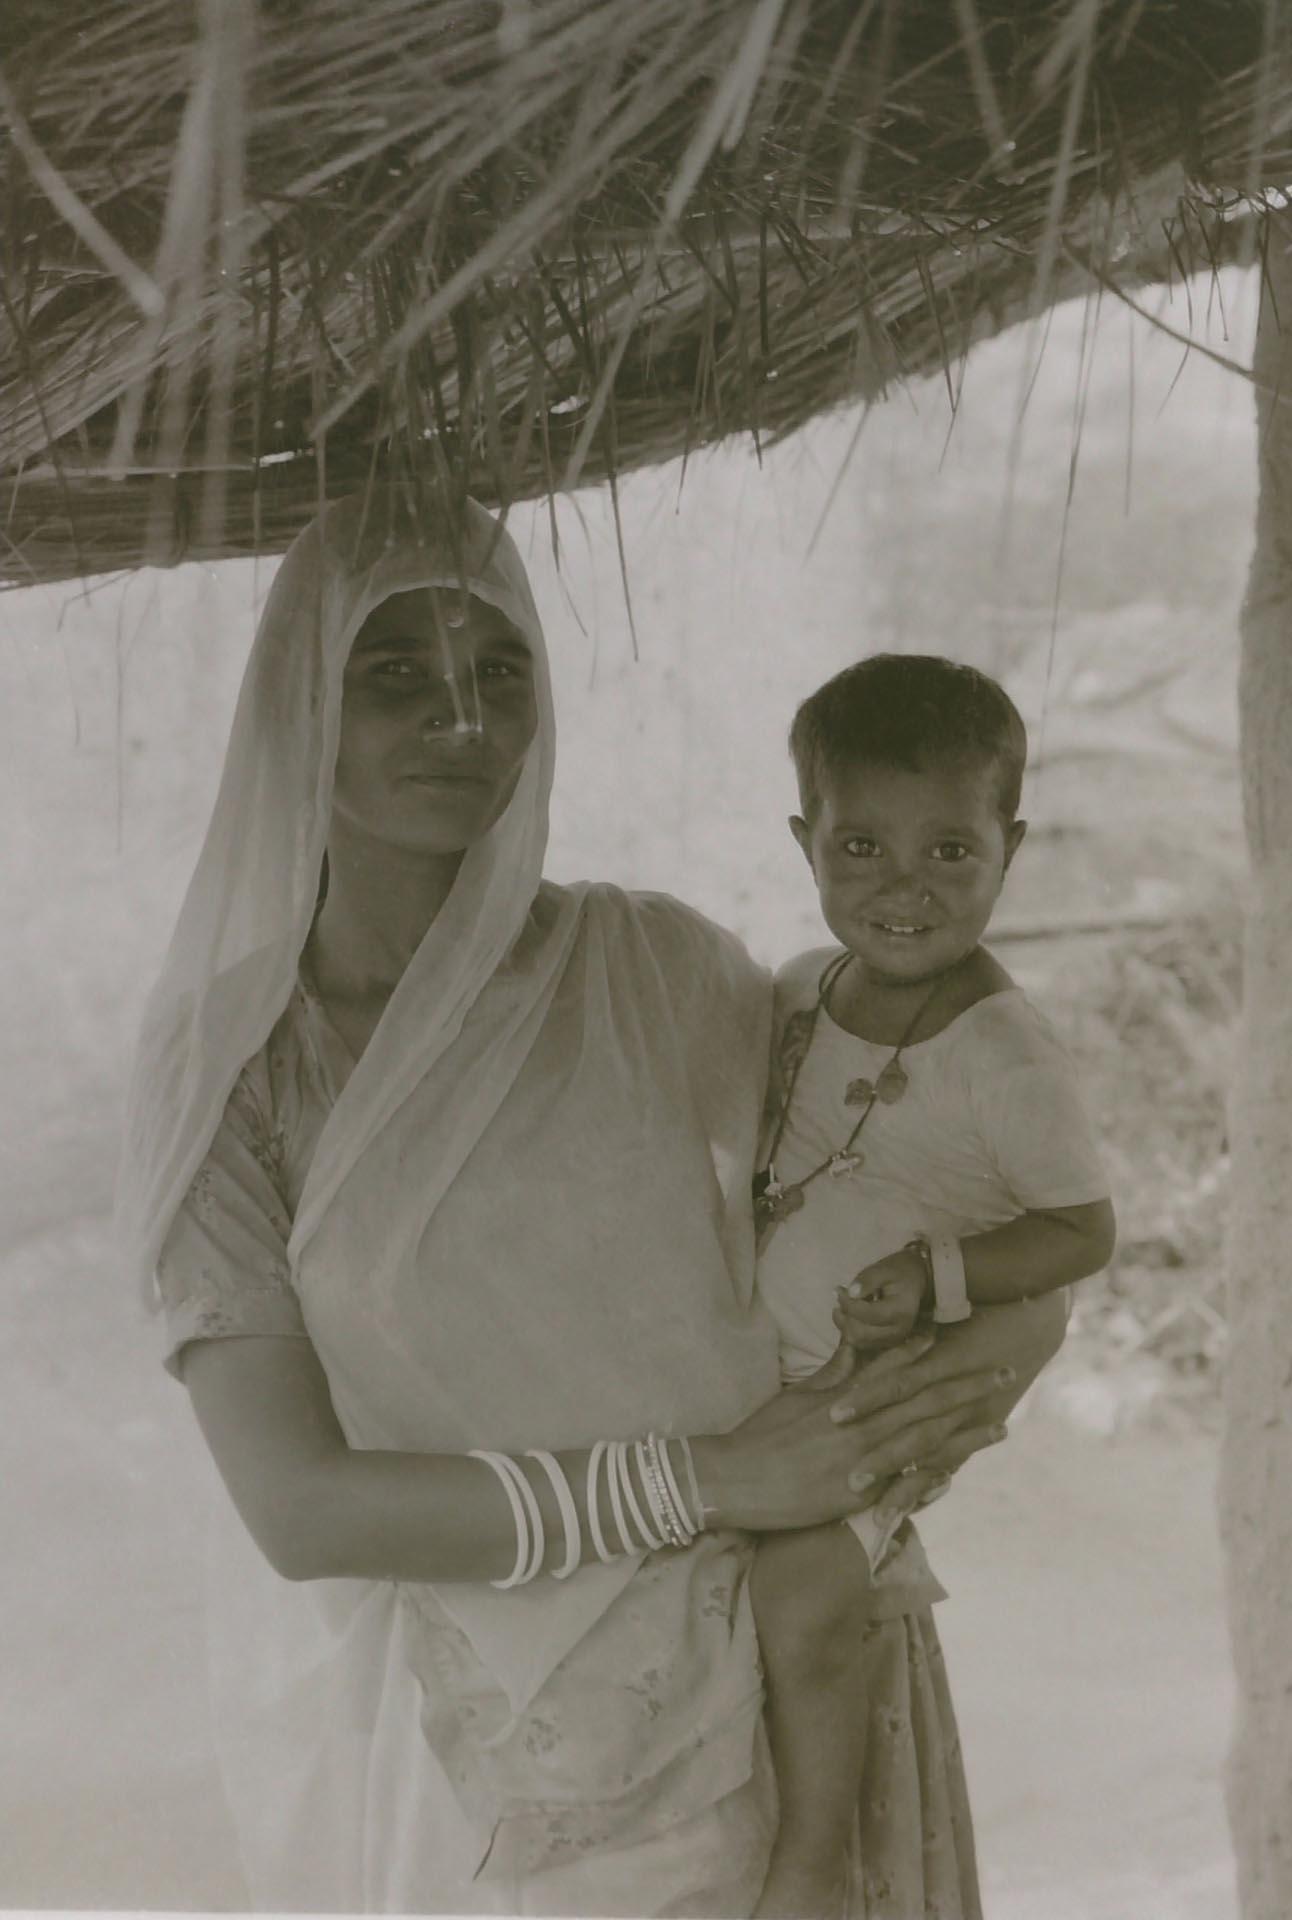 013-Maternità,Jaipur,India 1990